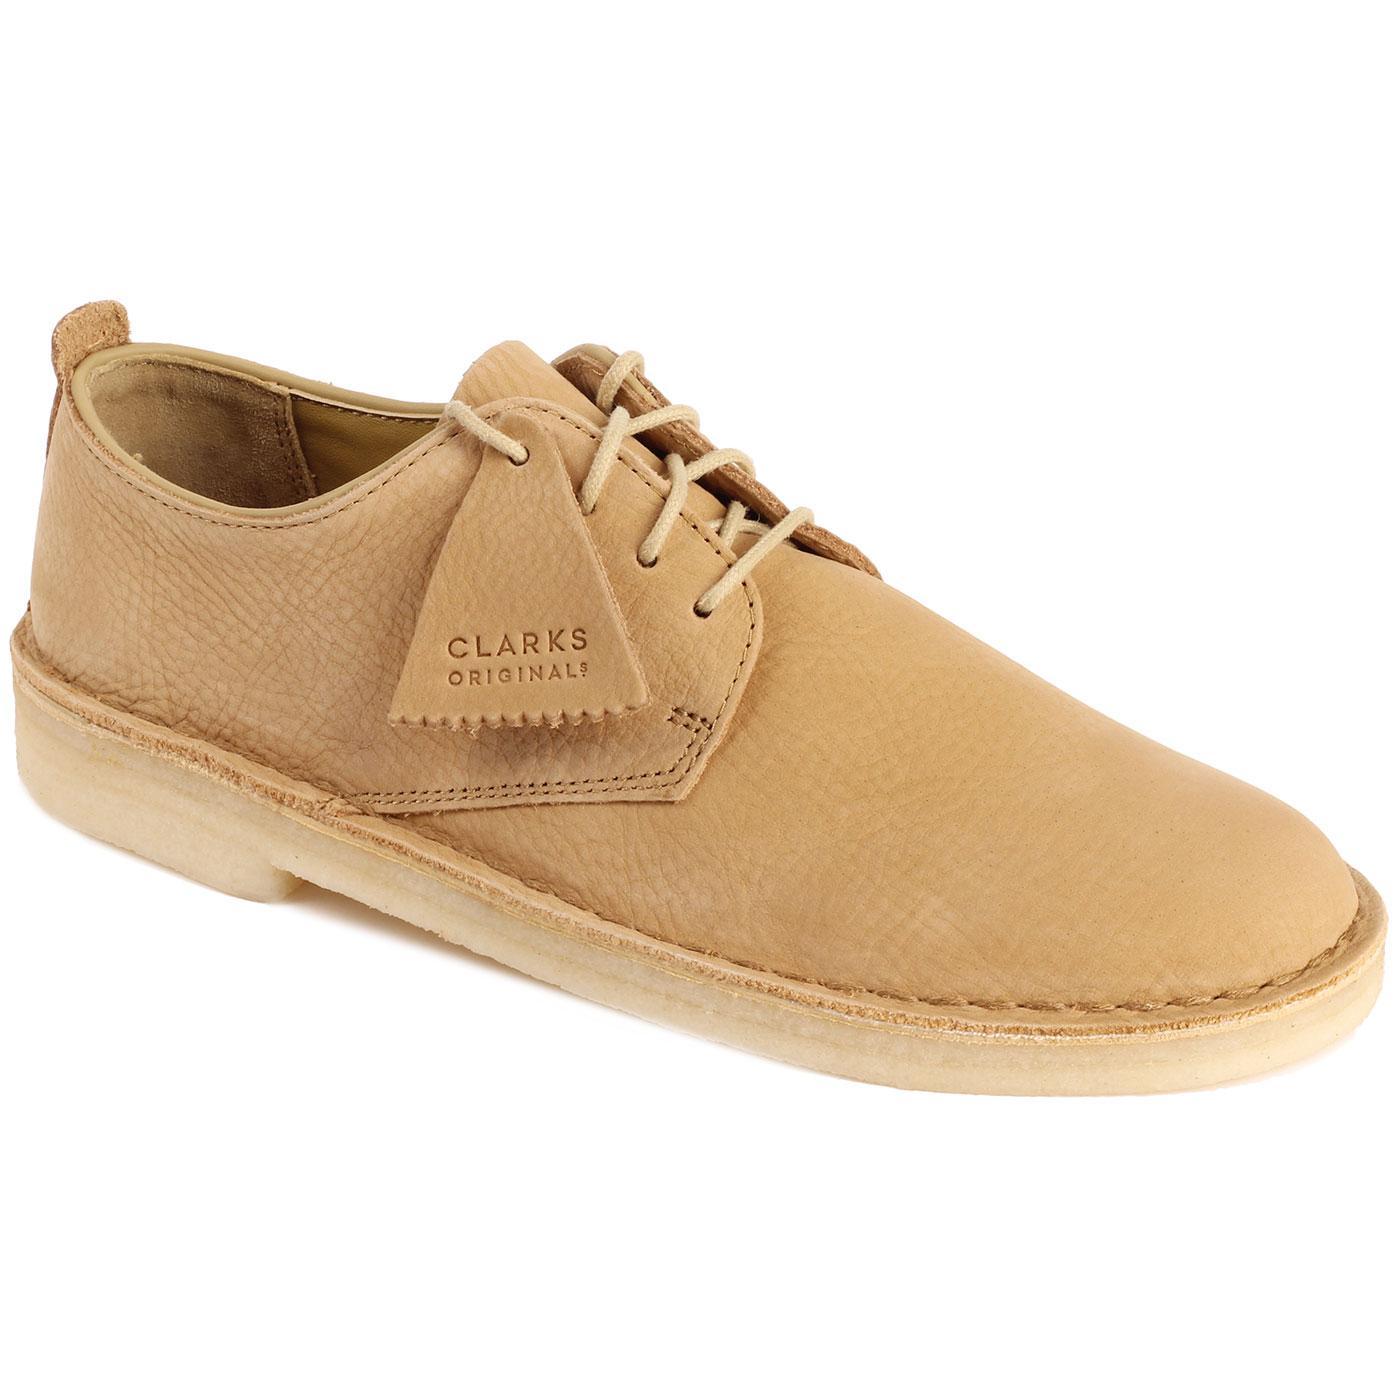 Desert London CLARKS ORIGINALS Nubuck Shoes MAPLE